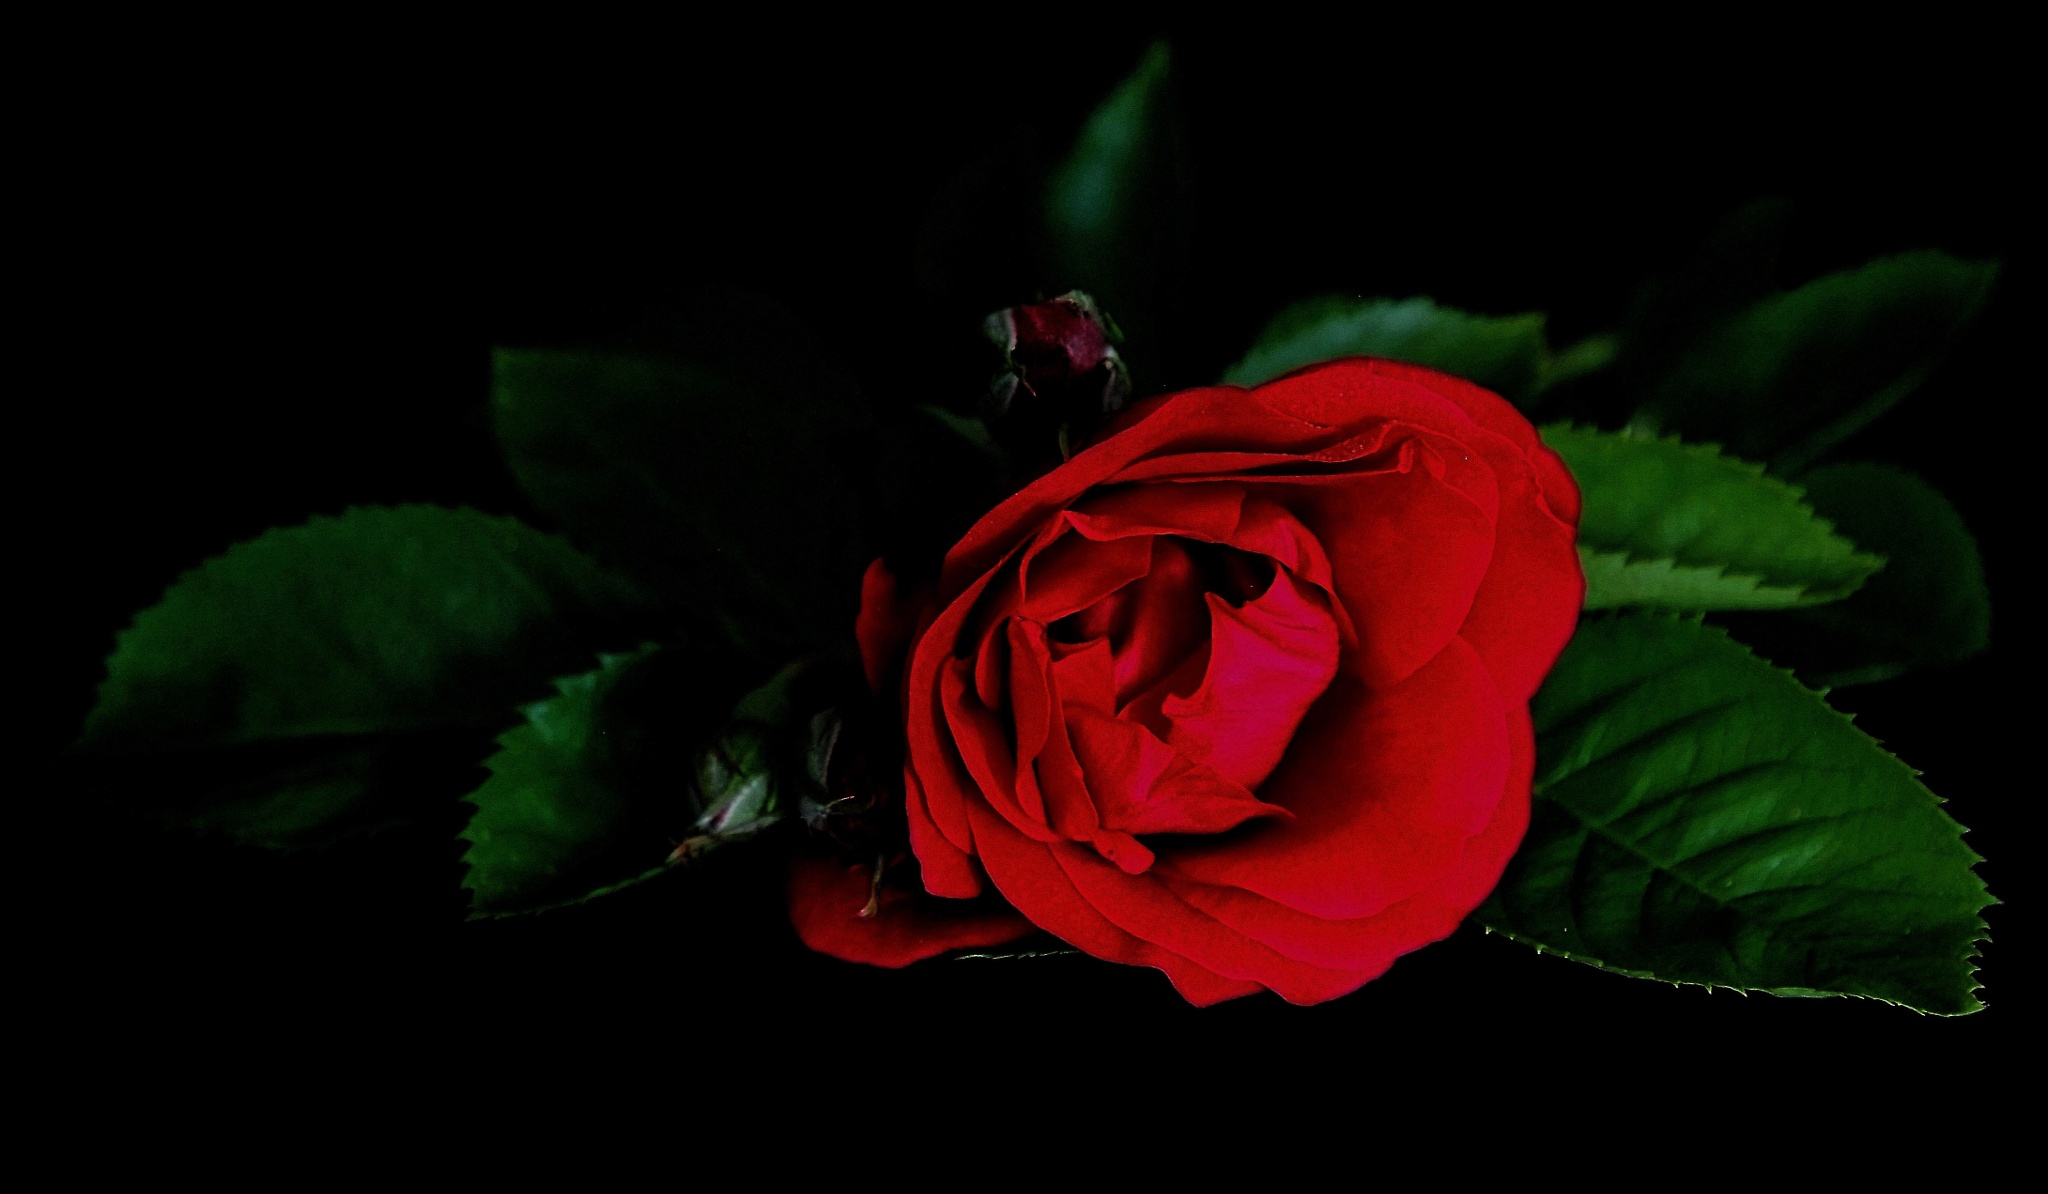 Rose by zabazulu